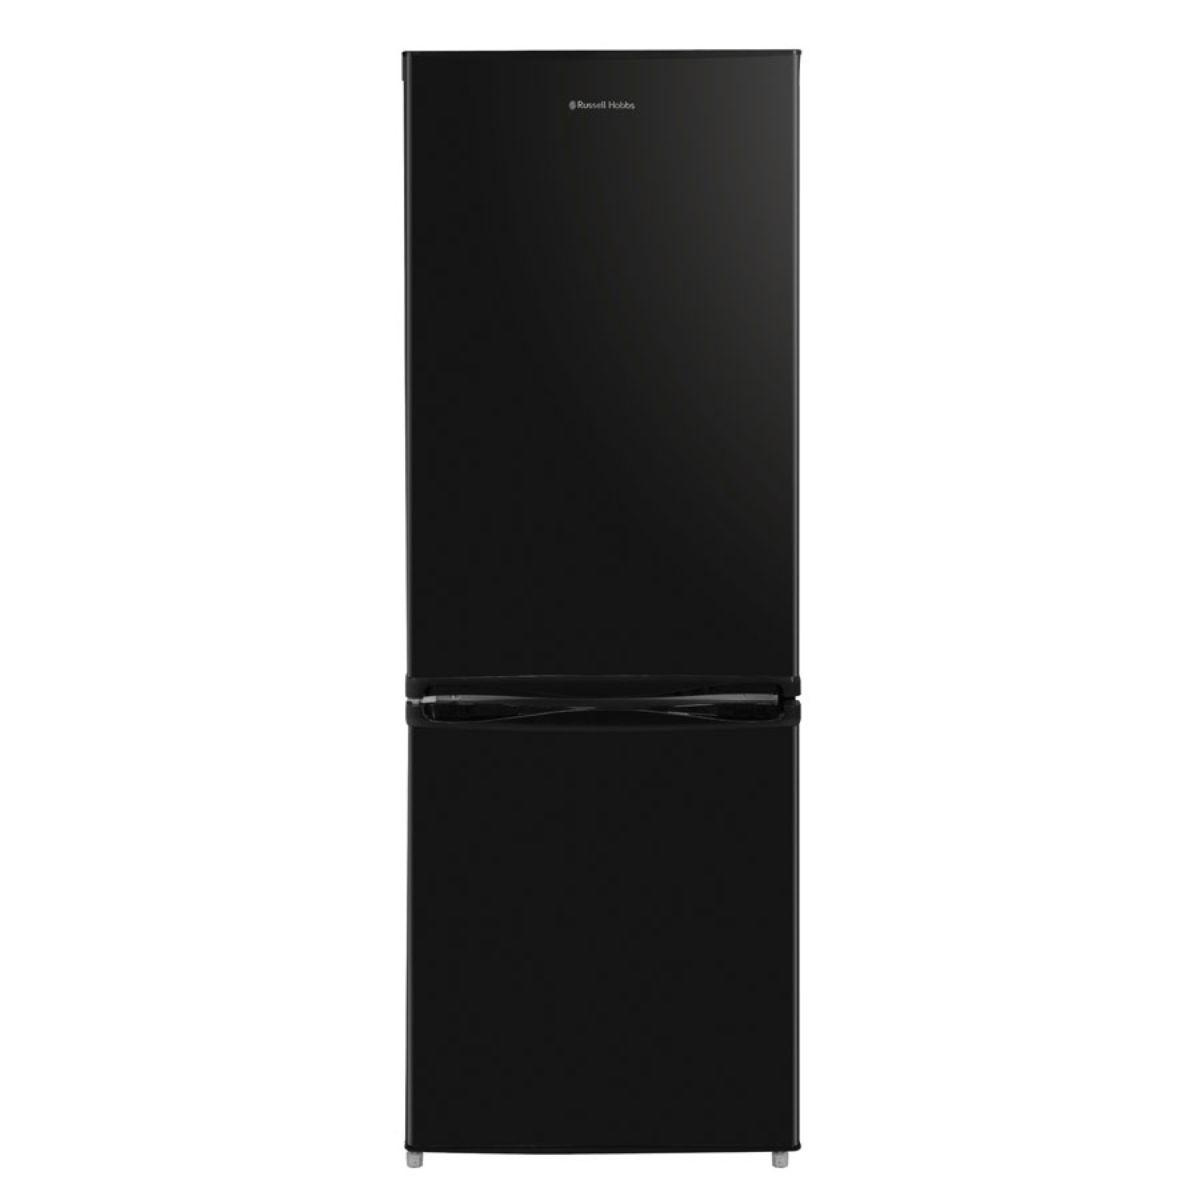 Russell Hobbs RH55FF171B Wide 230L Freestanding Fridge Freezer - Black